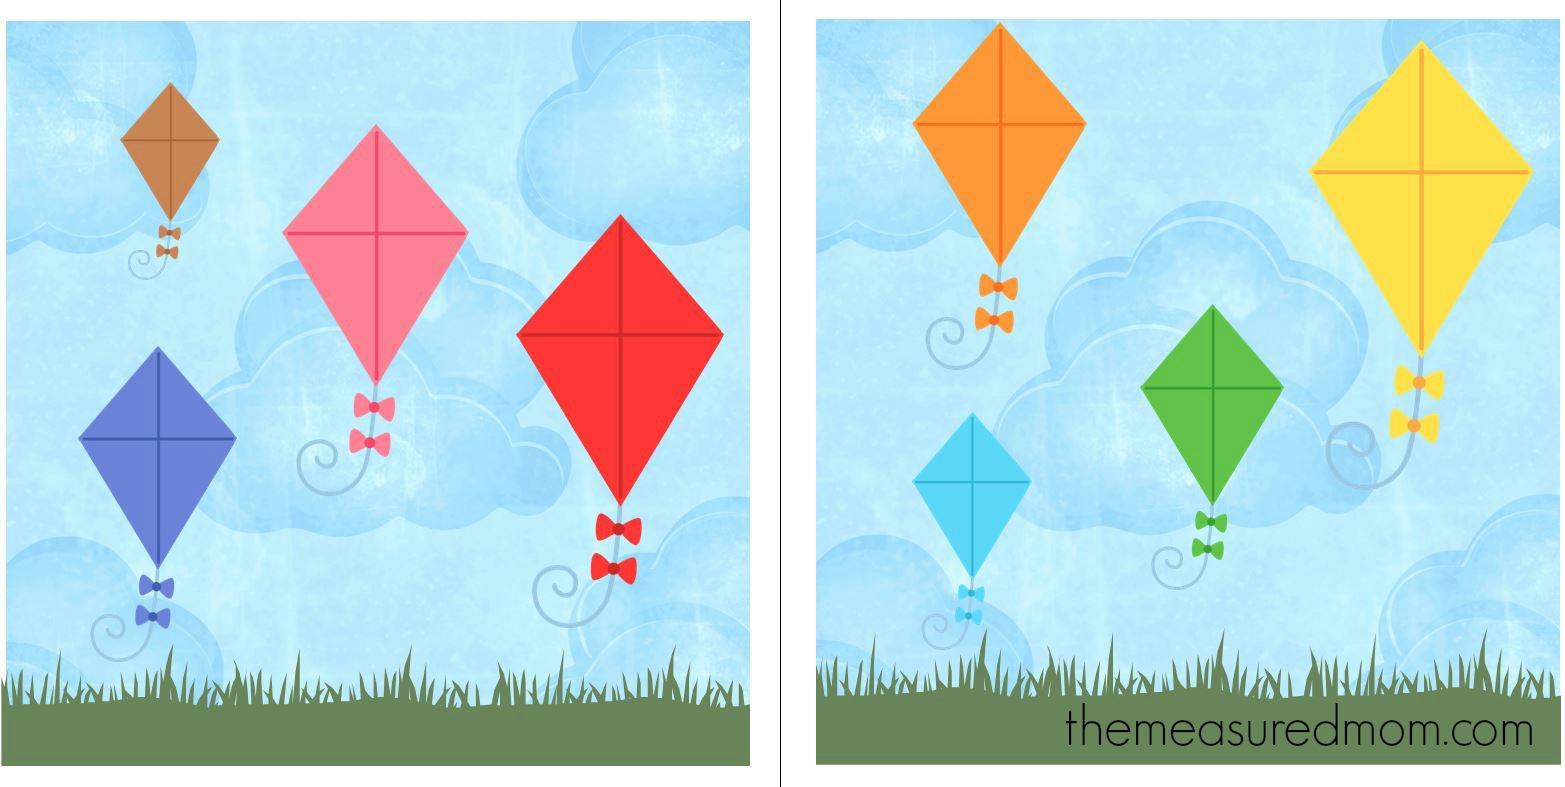 Free File Folder Game For Preschoolers: Kites! - The Measured Mom - Free Printable Folder Games